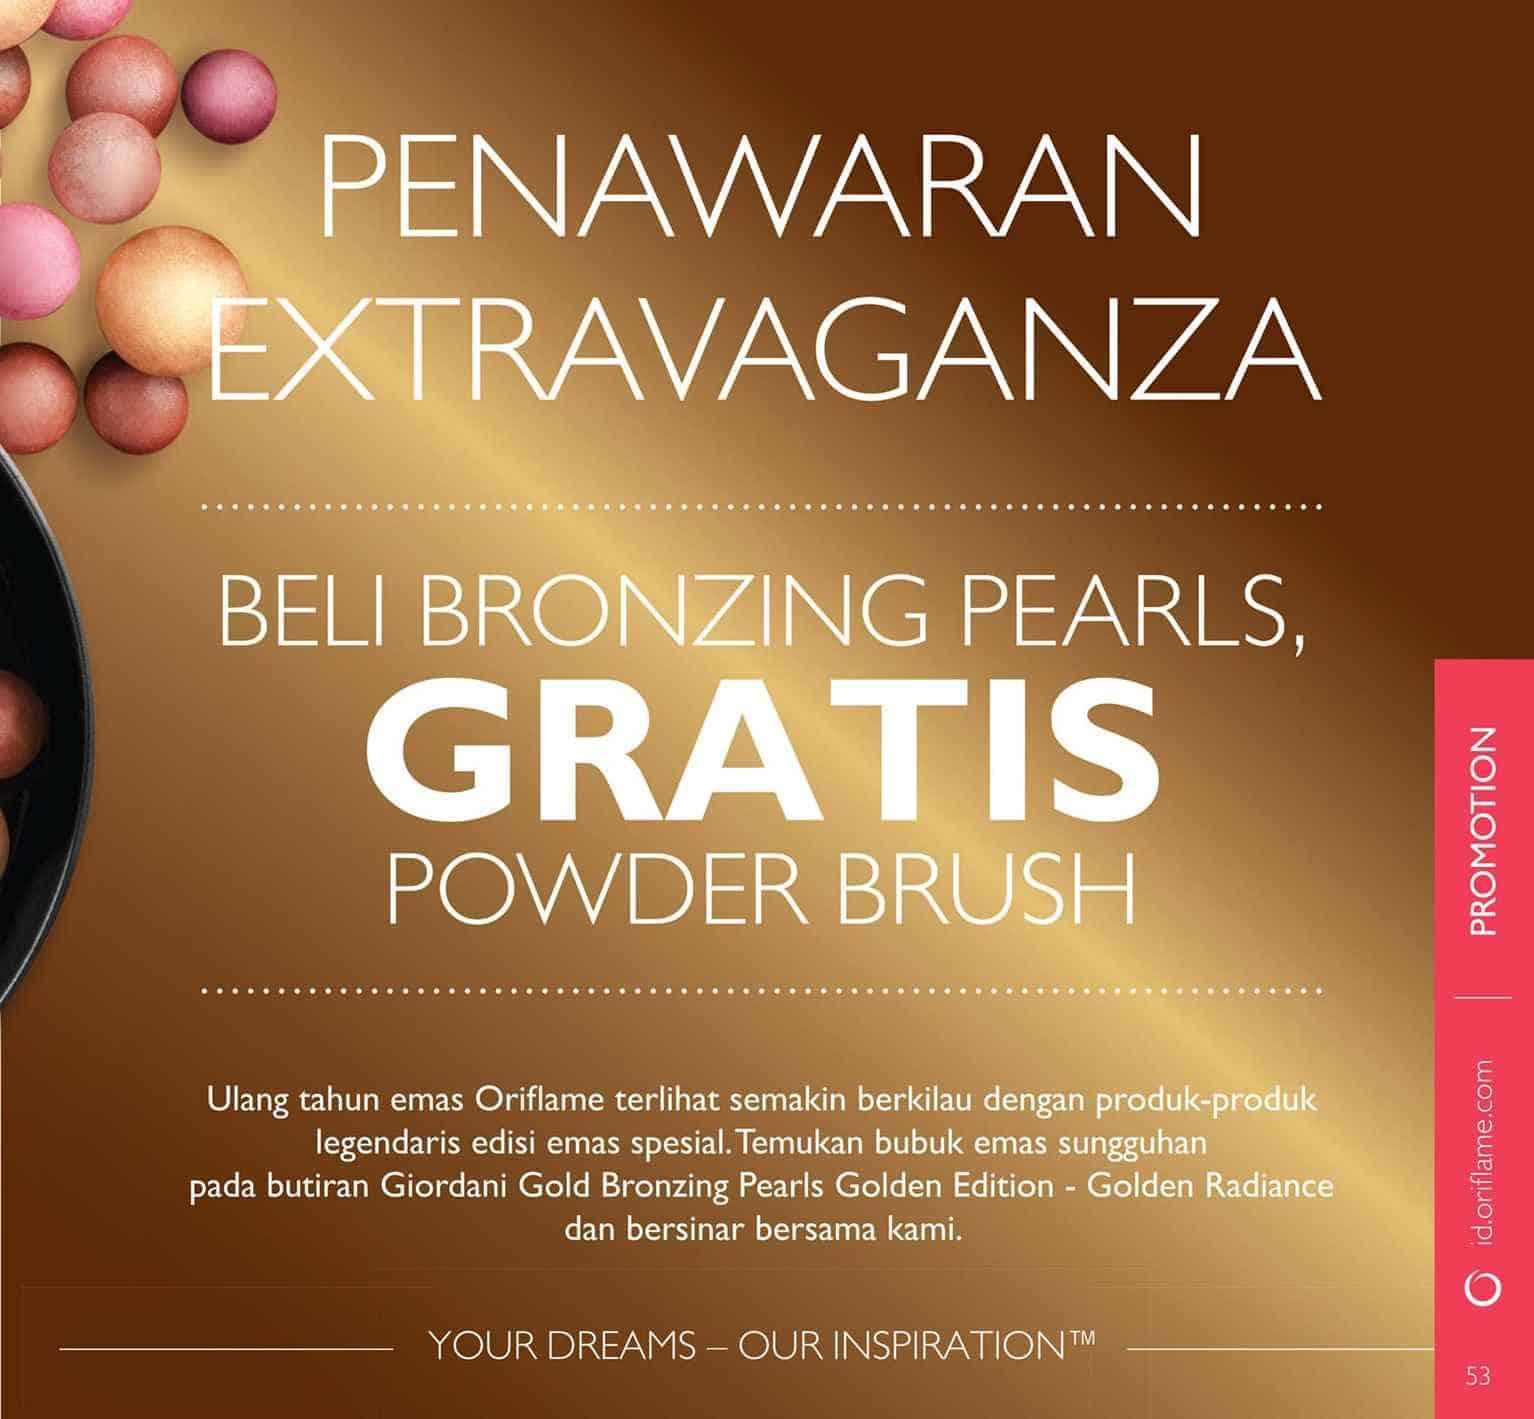 Jual Giordani Gold Bronzing Pearls Golden Edition Golden Radiance oriflame Je s Wardrobe